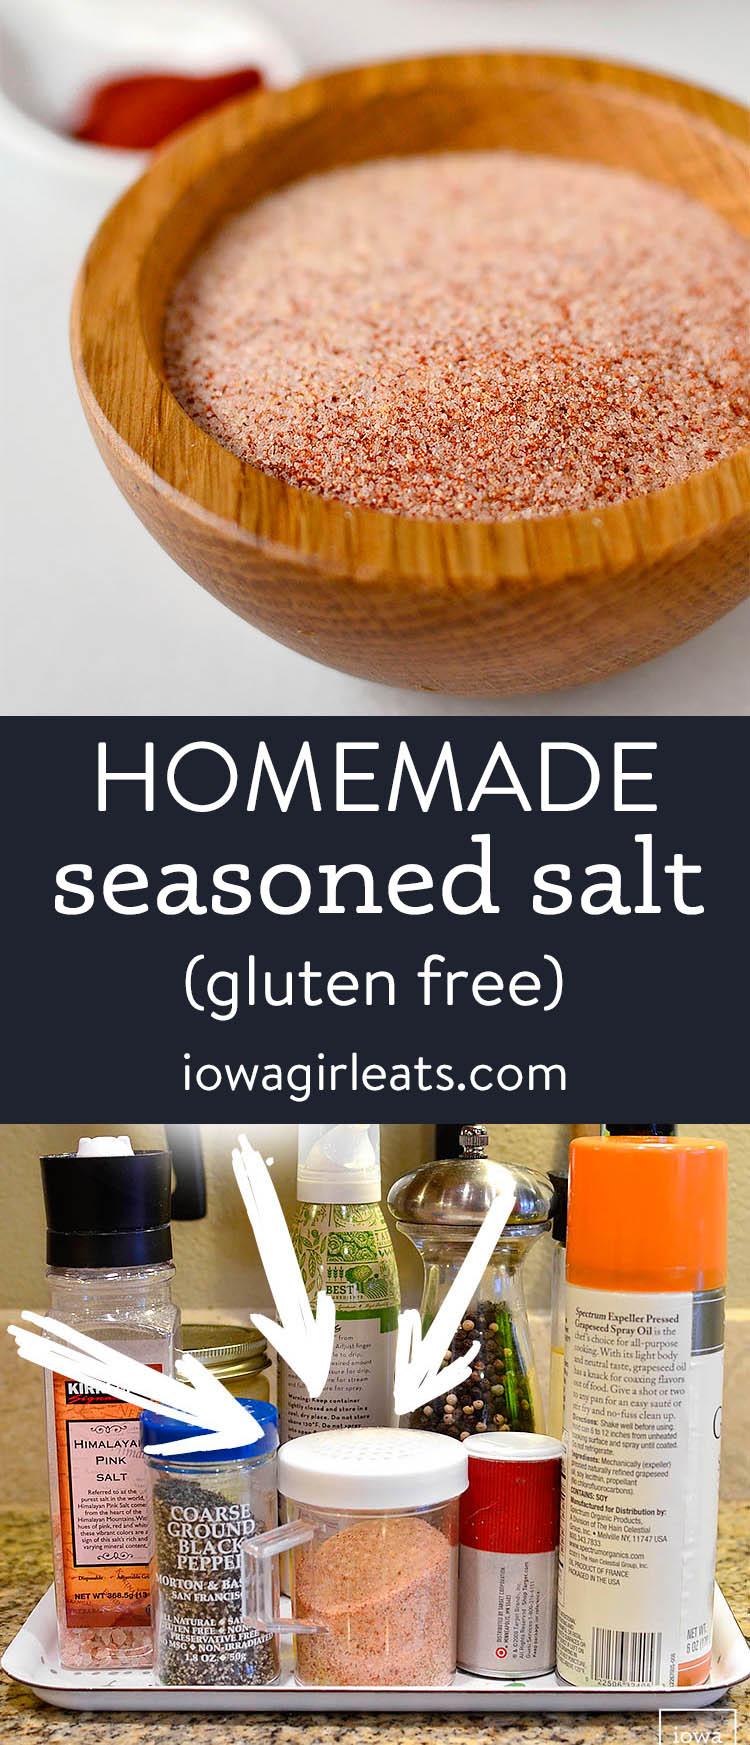 photo collage of homemade seasoned salt